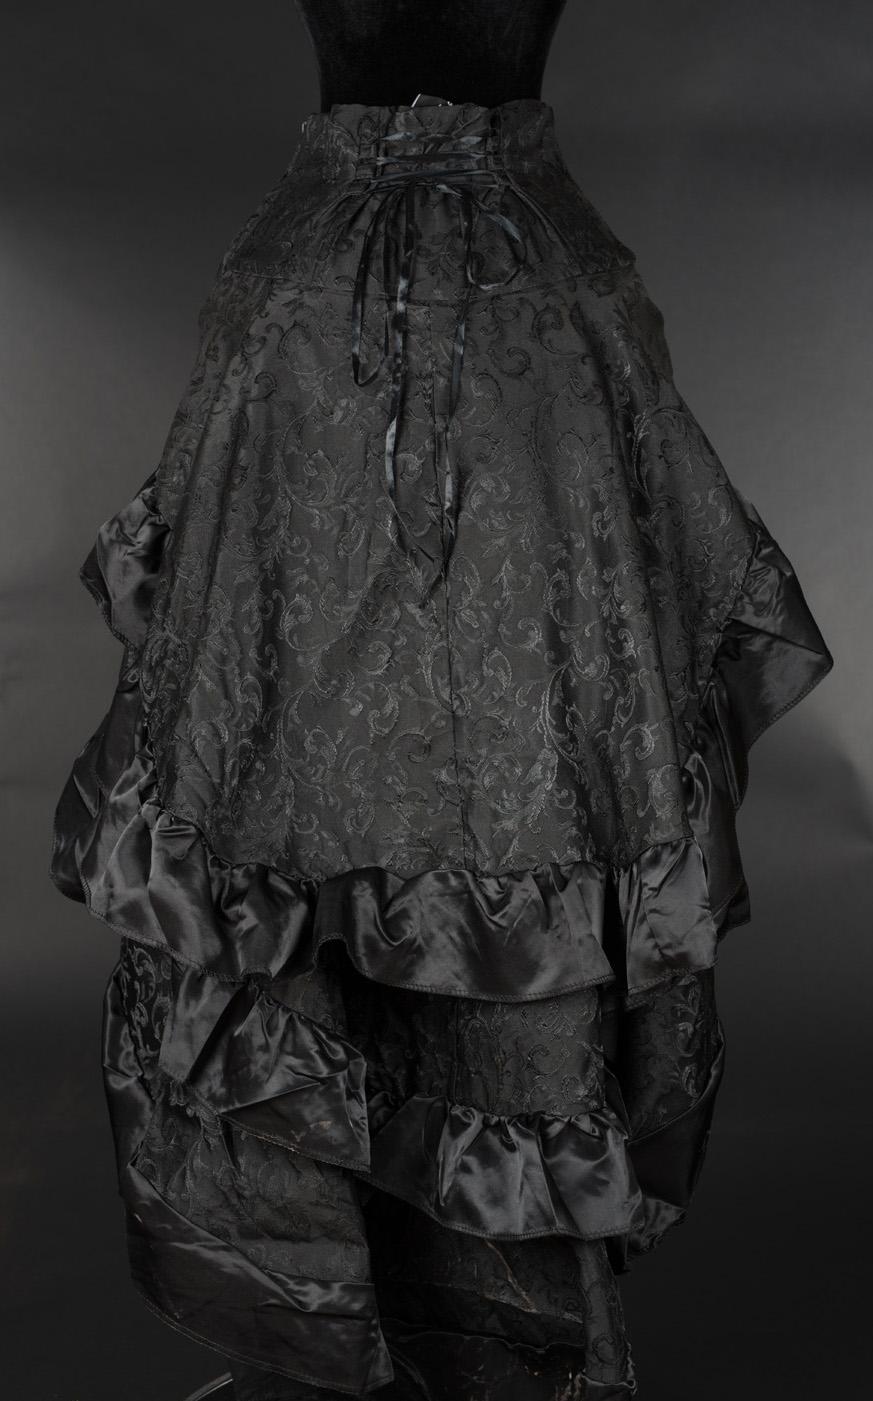 rebelsmarket_black_brocade_adjustable_long_bustle_3_layer_ruffle_victorian_goth_skirt__skirts_2.jpg